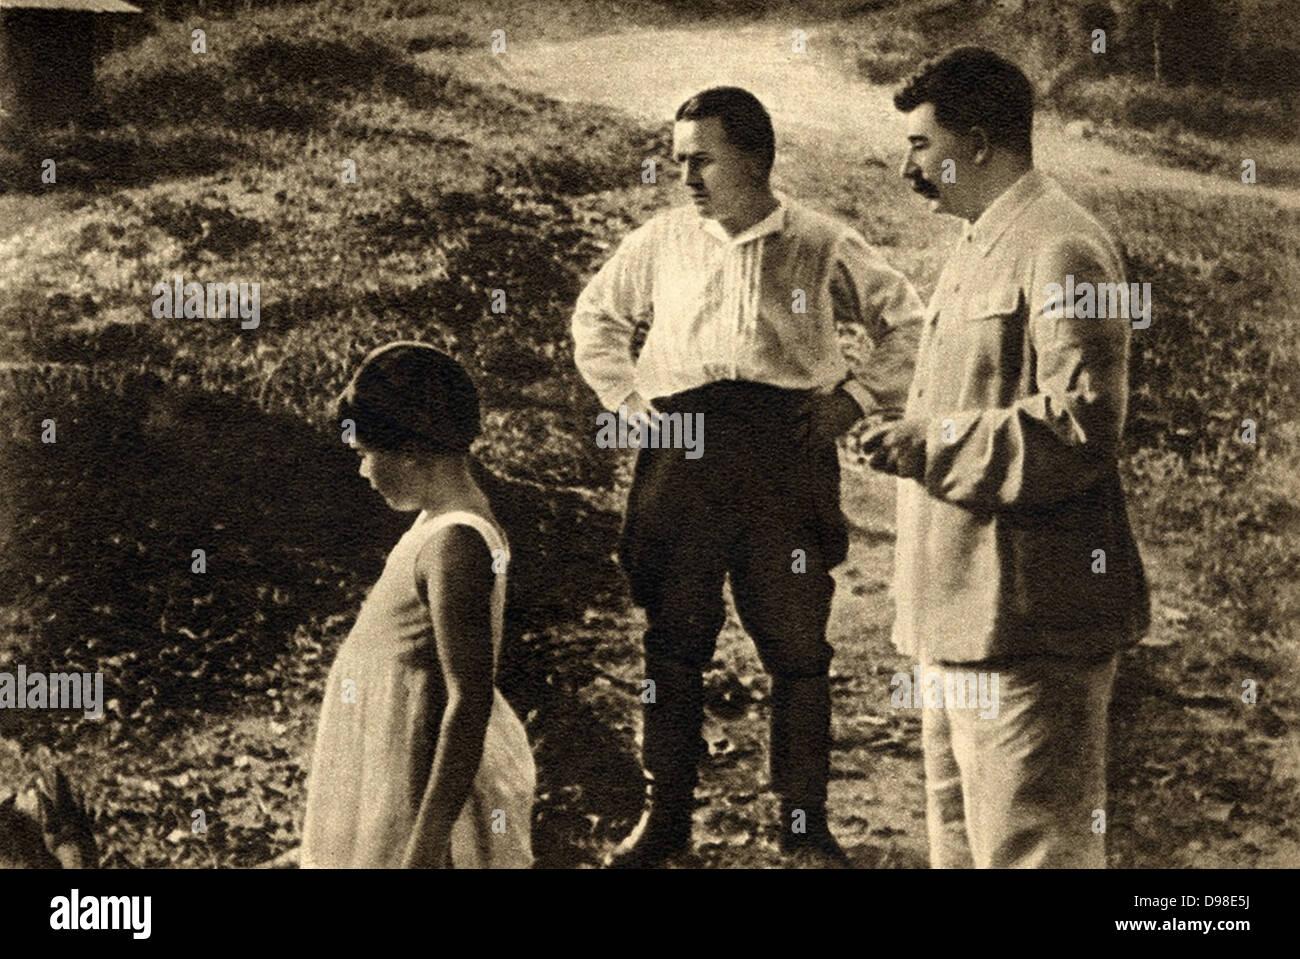 Sergei Kirov (1886-1934) early Bolshevik leader, centre, with Joseph Stalin and his daughtert Svetlana. - Stock Image